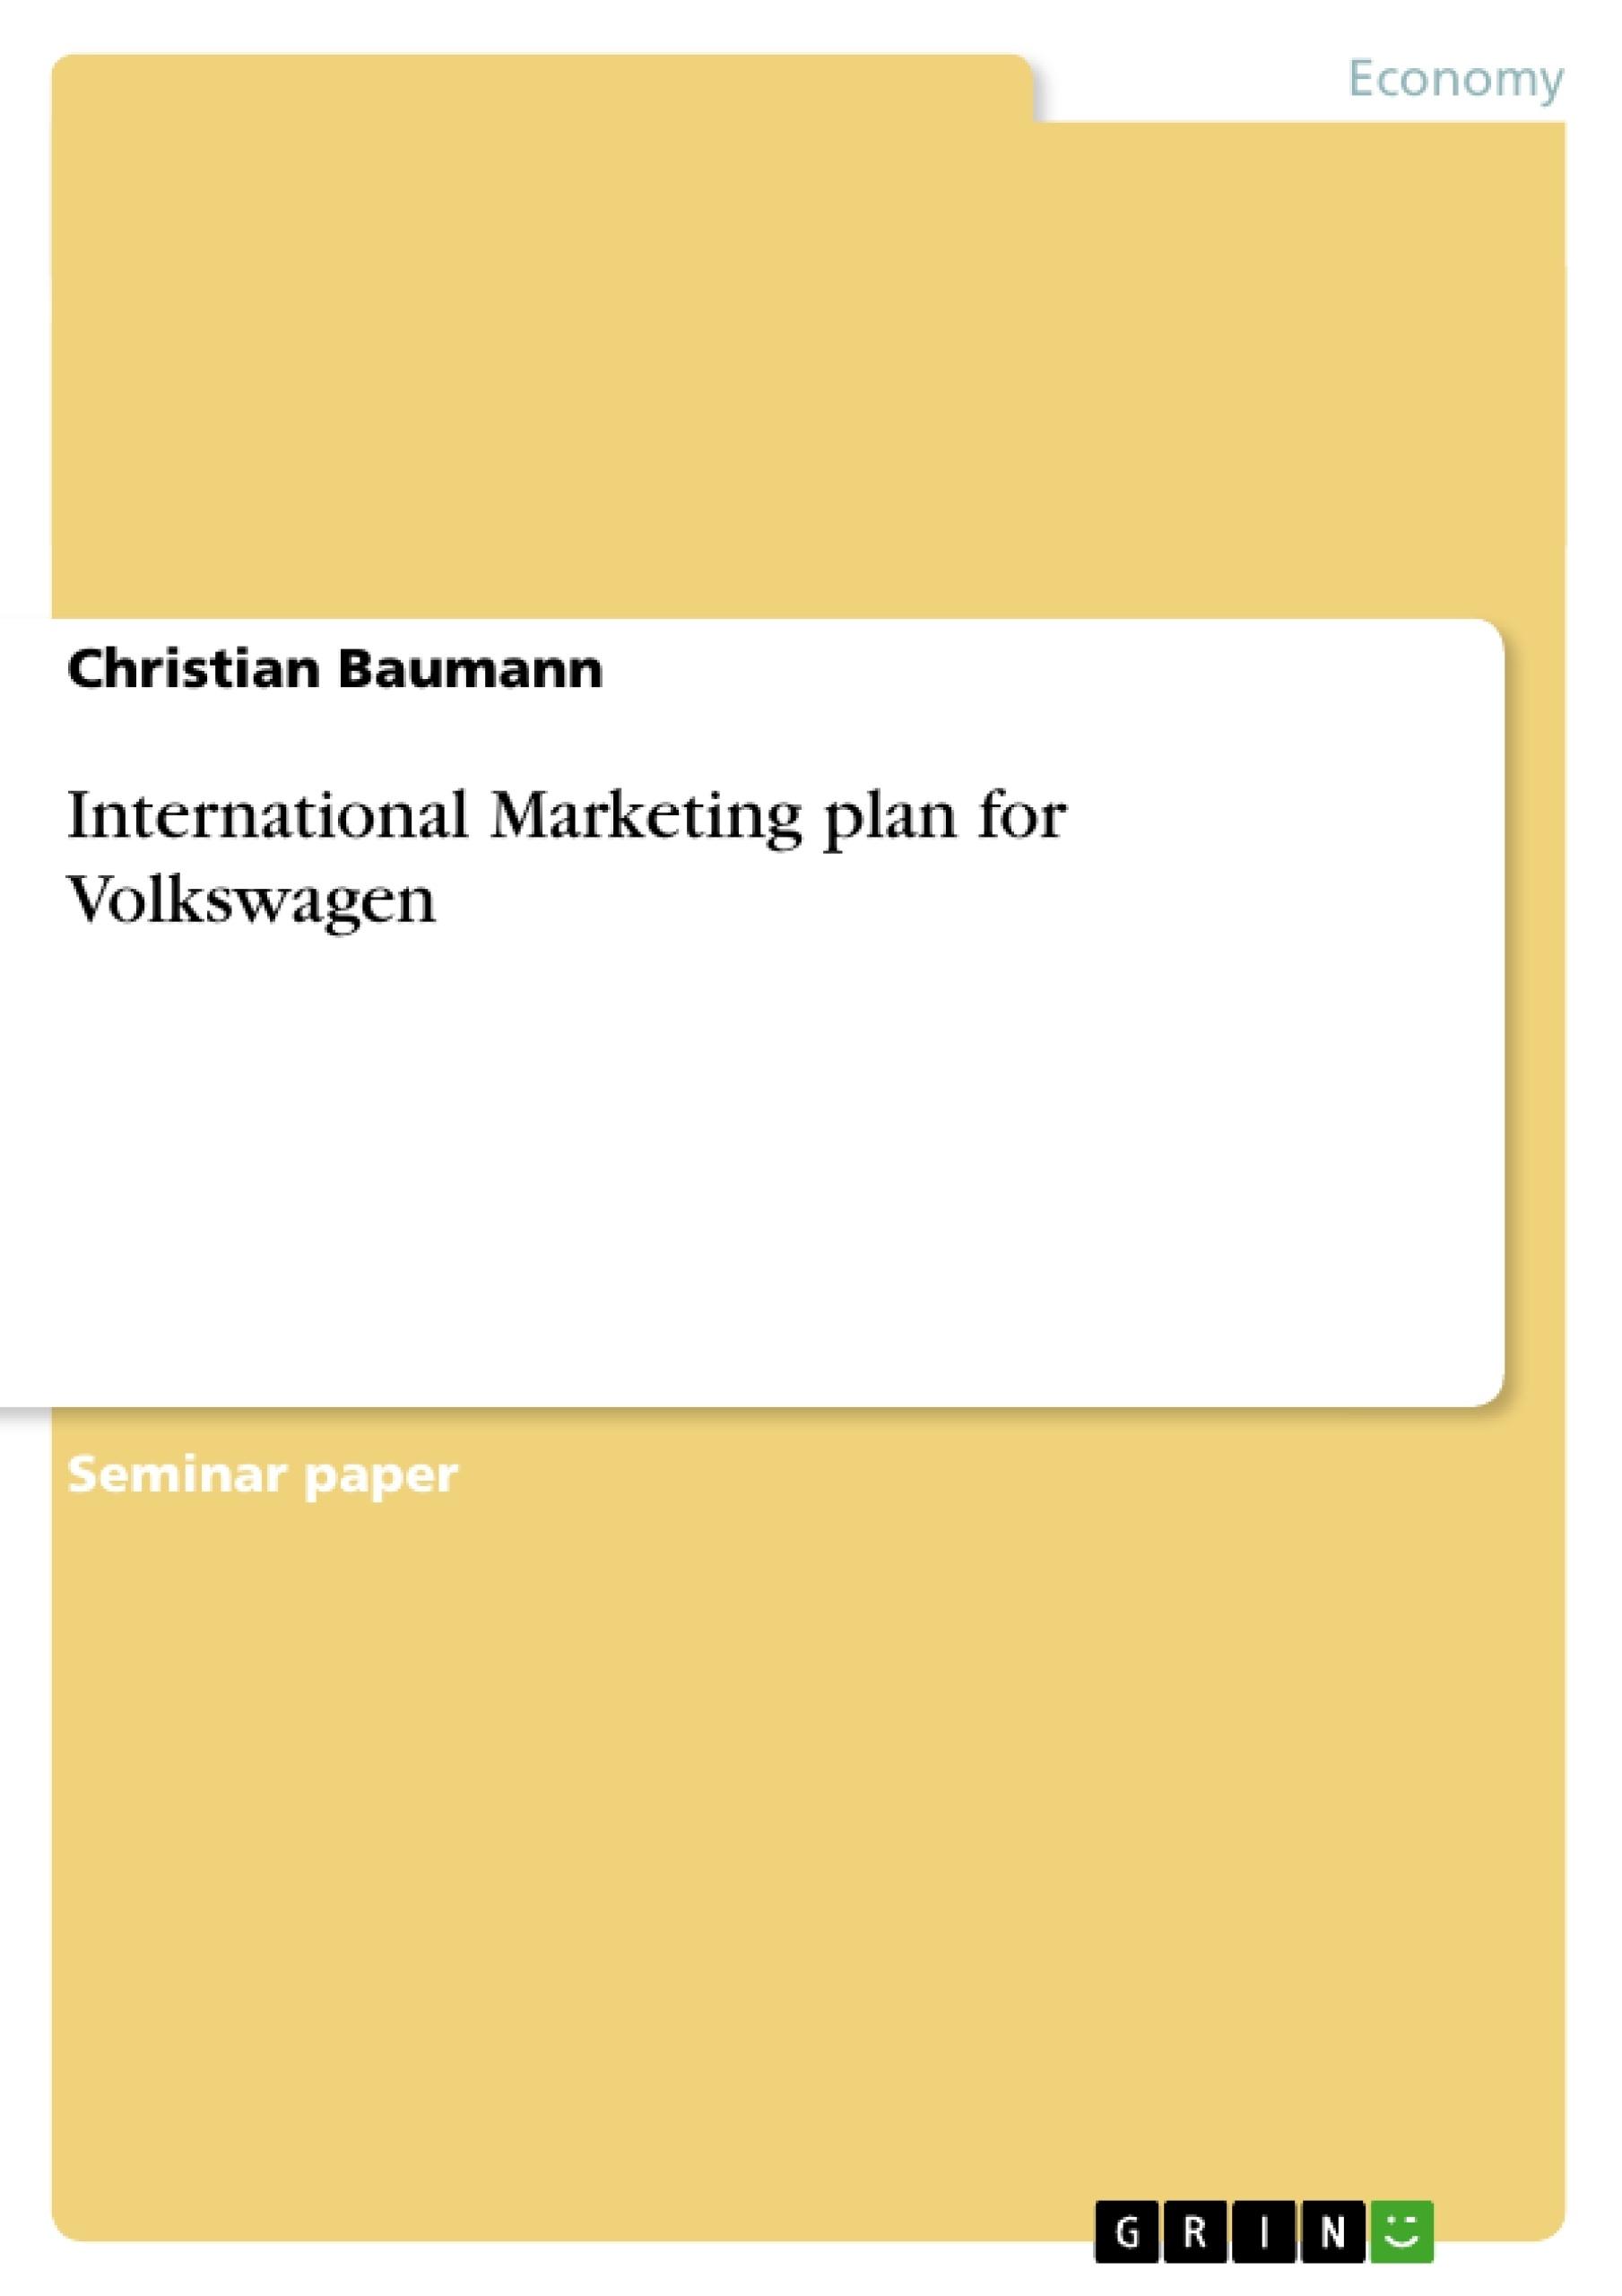 Title: International Marketing plan for Volkswagen